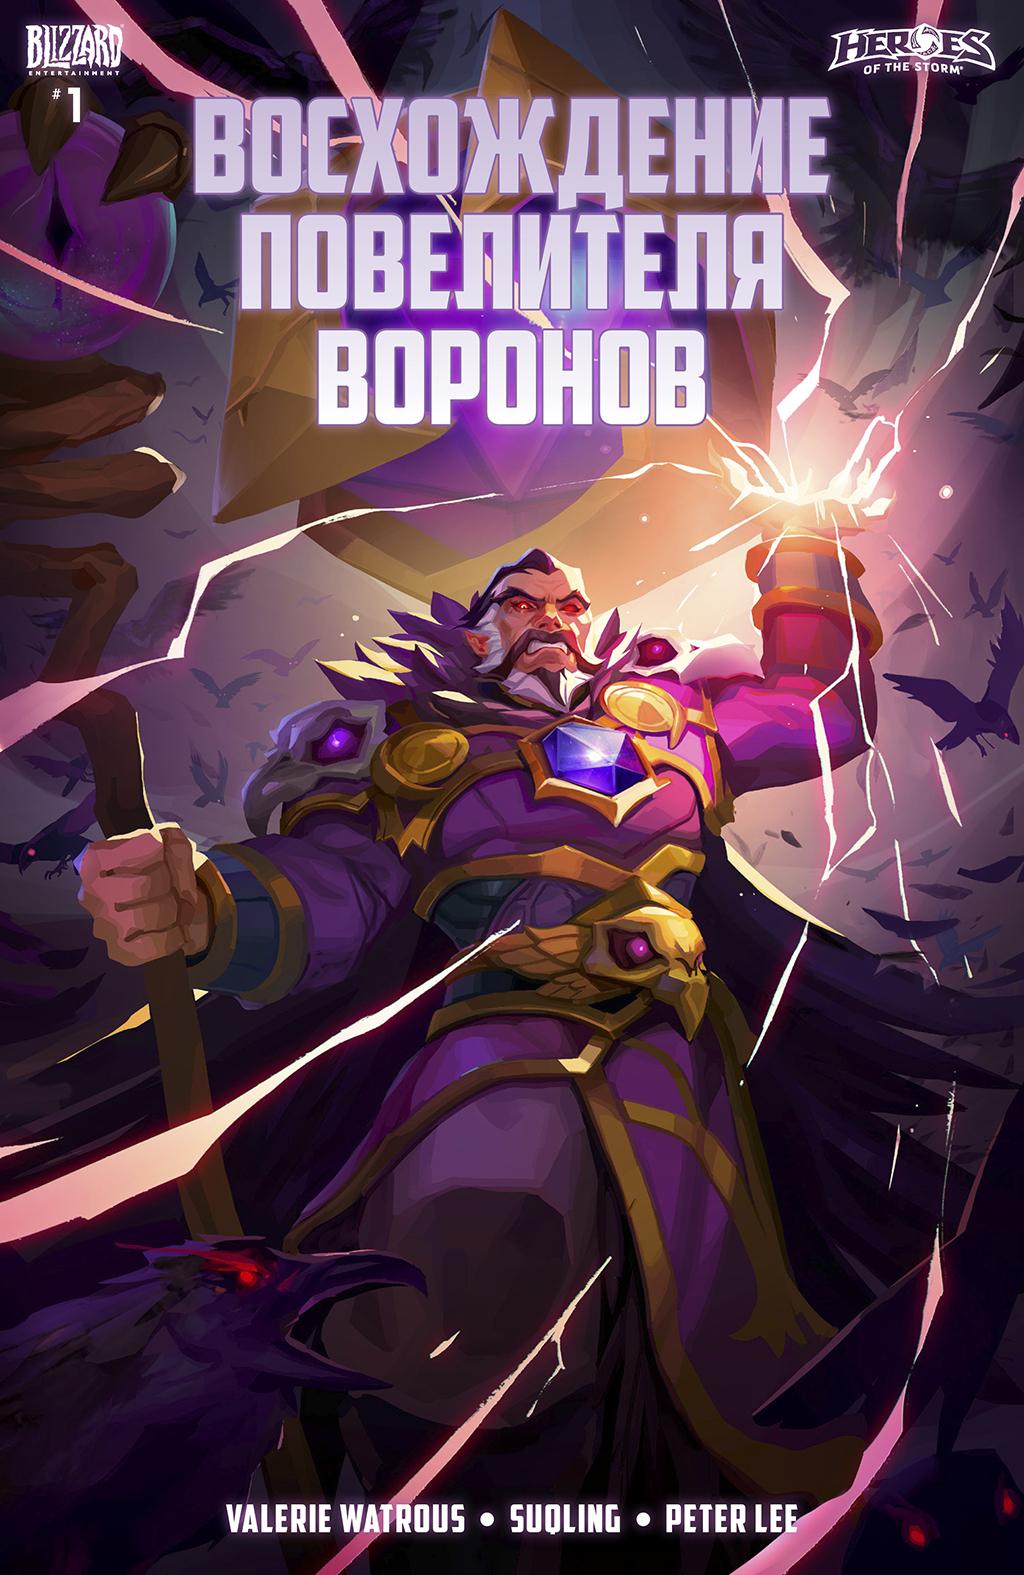 Комикс Герои бури Восход Повелителя Воронов